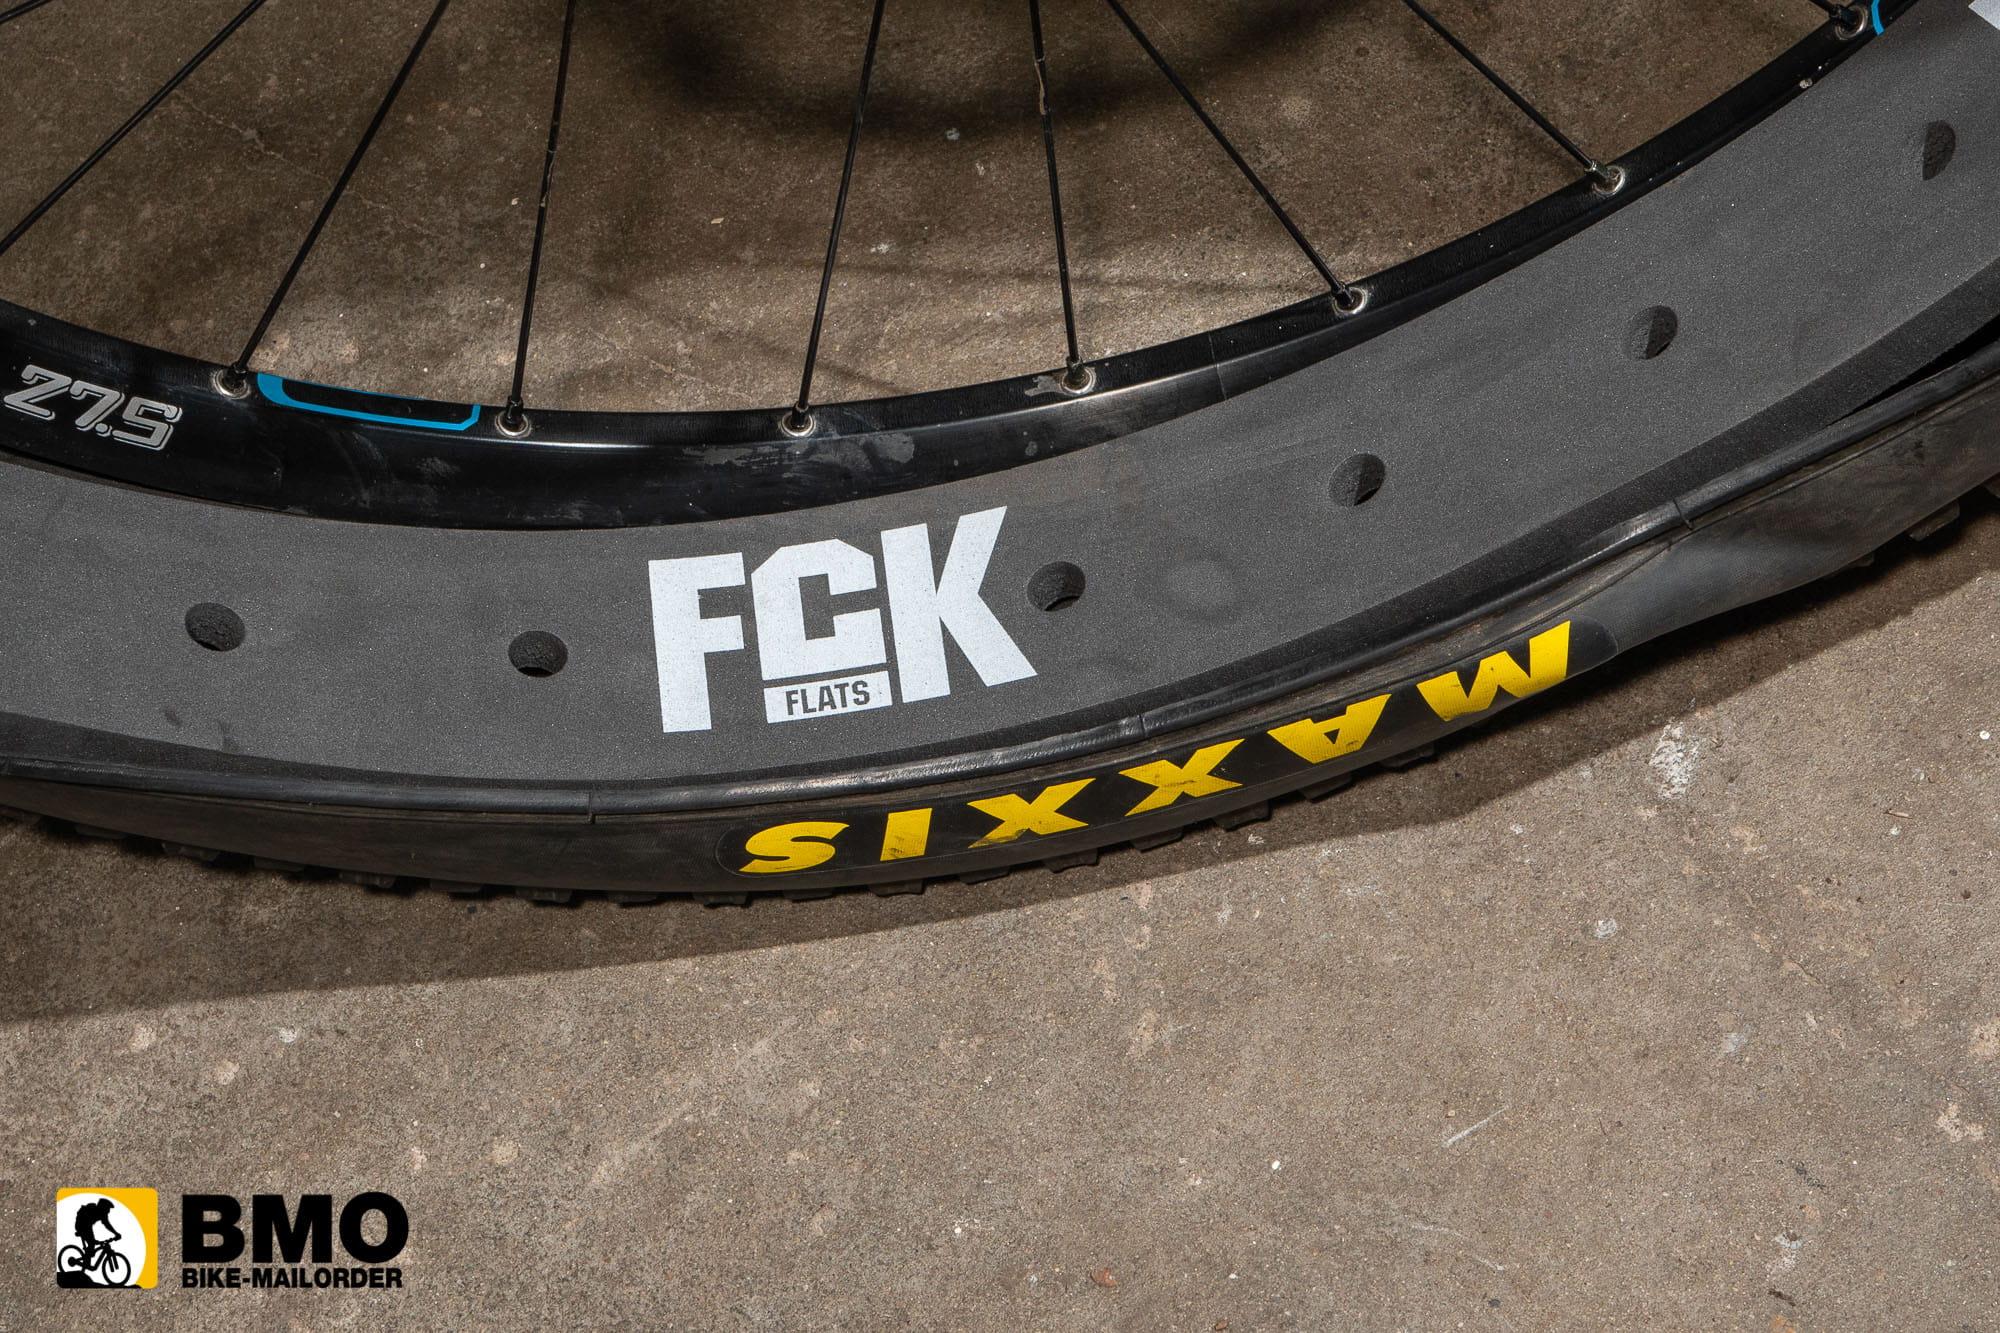 FCK-Flats-BMO-Bike-Mailorder-4